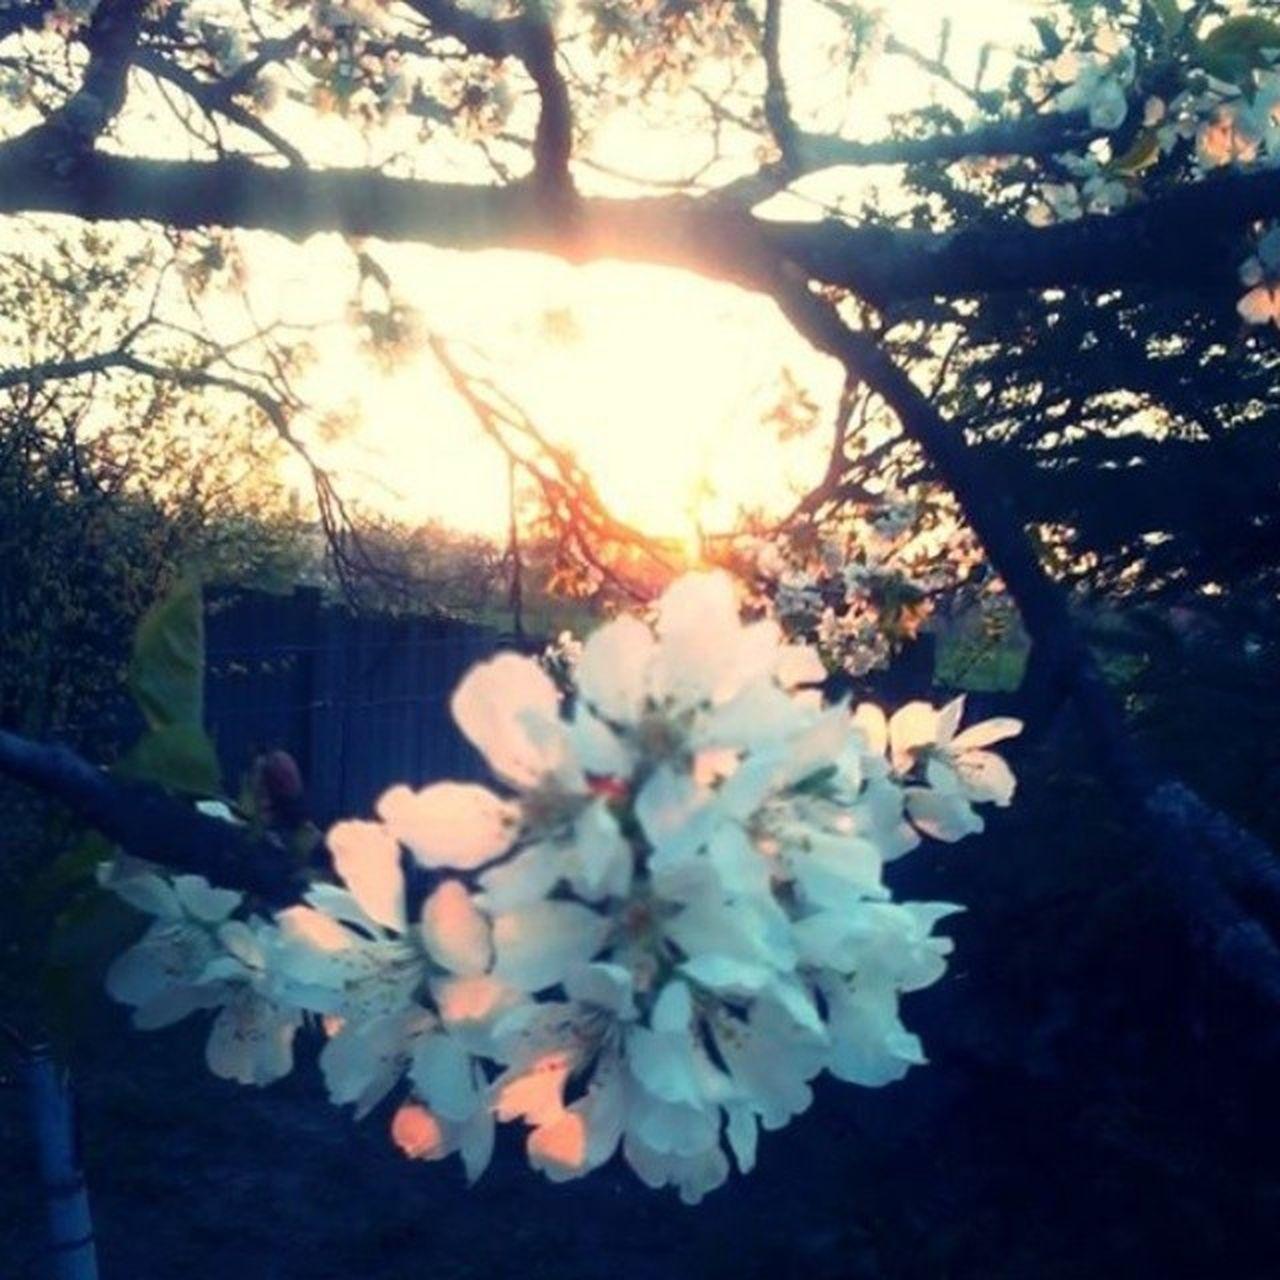 Flower Cherry Imissyou Whereismylove ? Imissthattime Goodolddays Spring Summer Sunshine Hungary Tree Home IWishYouWereHere Garden Nature Art Picture Life Behappy Dontcry Love